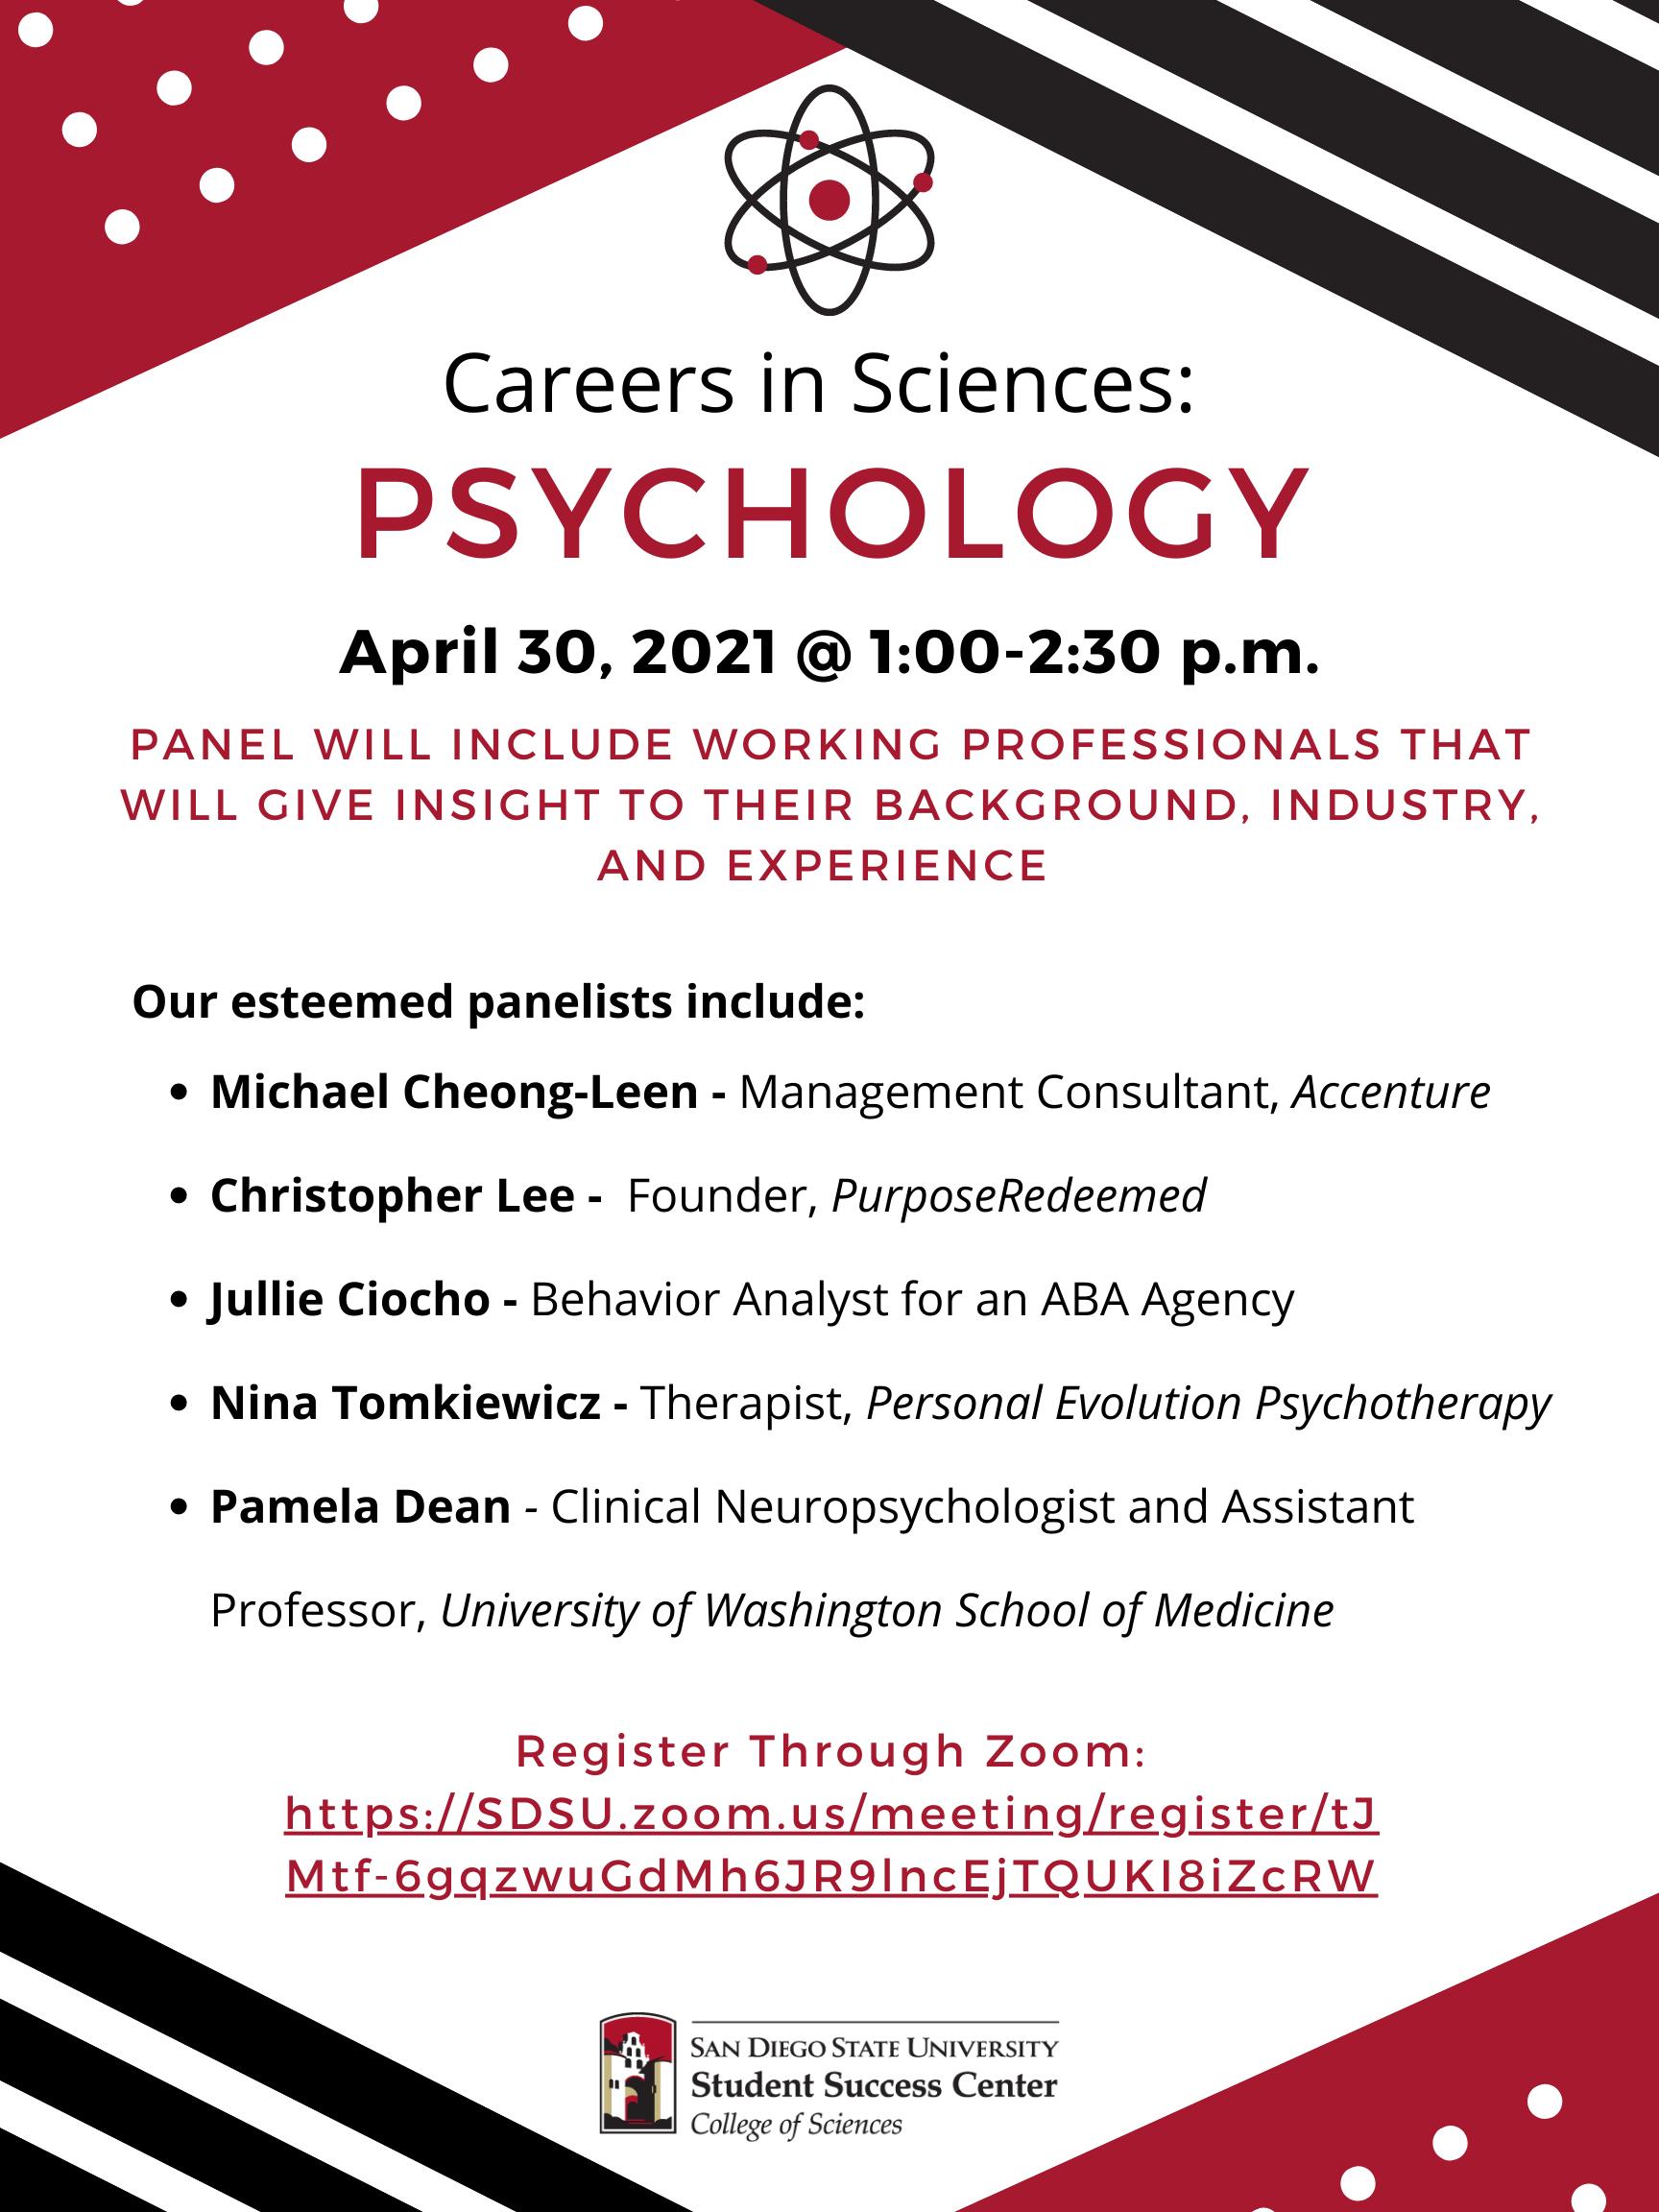 Psychology Career Panel flyer